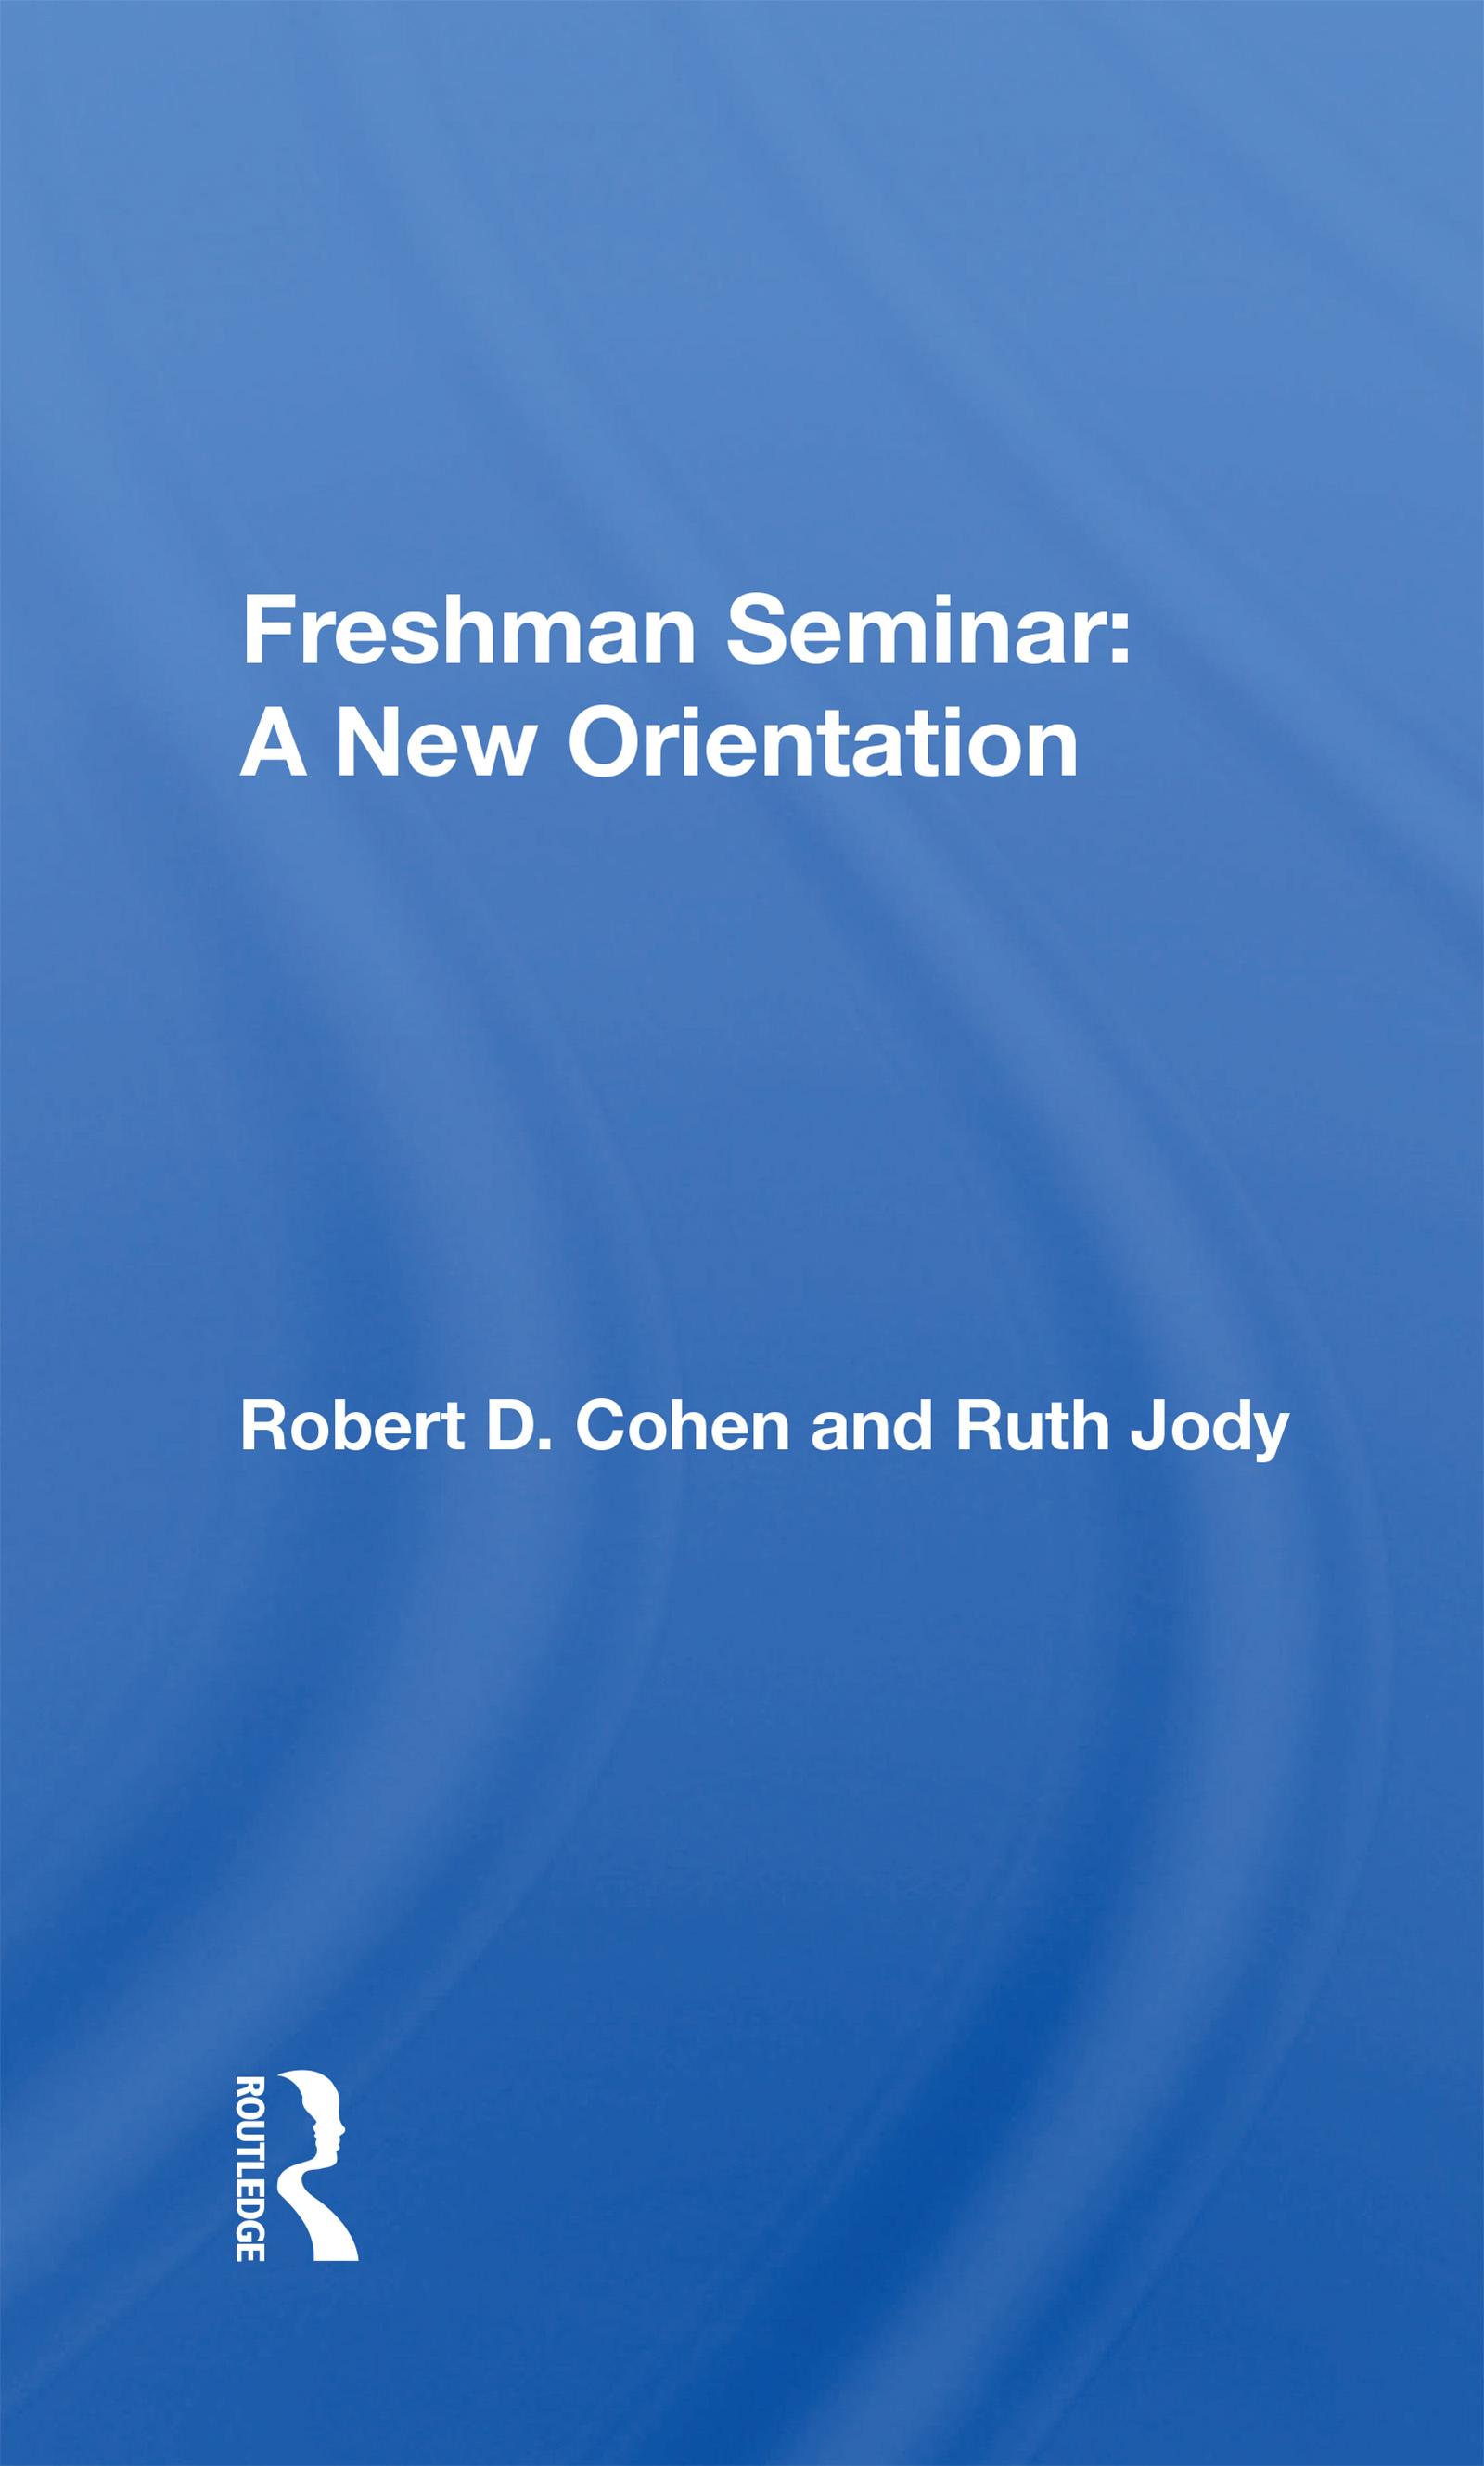 Freshman Seminar: A New Orientation